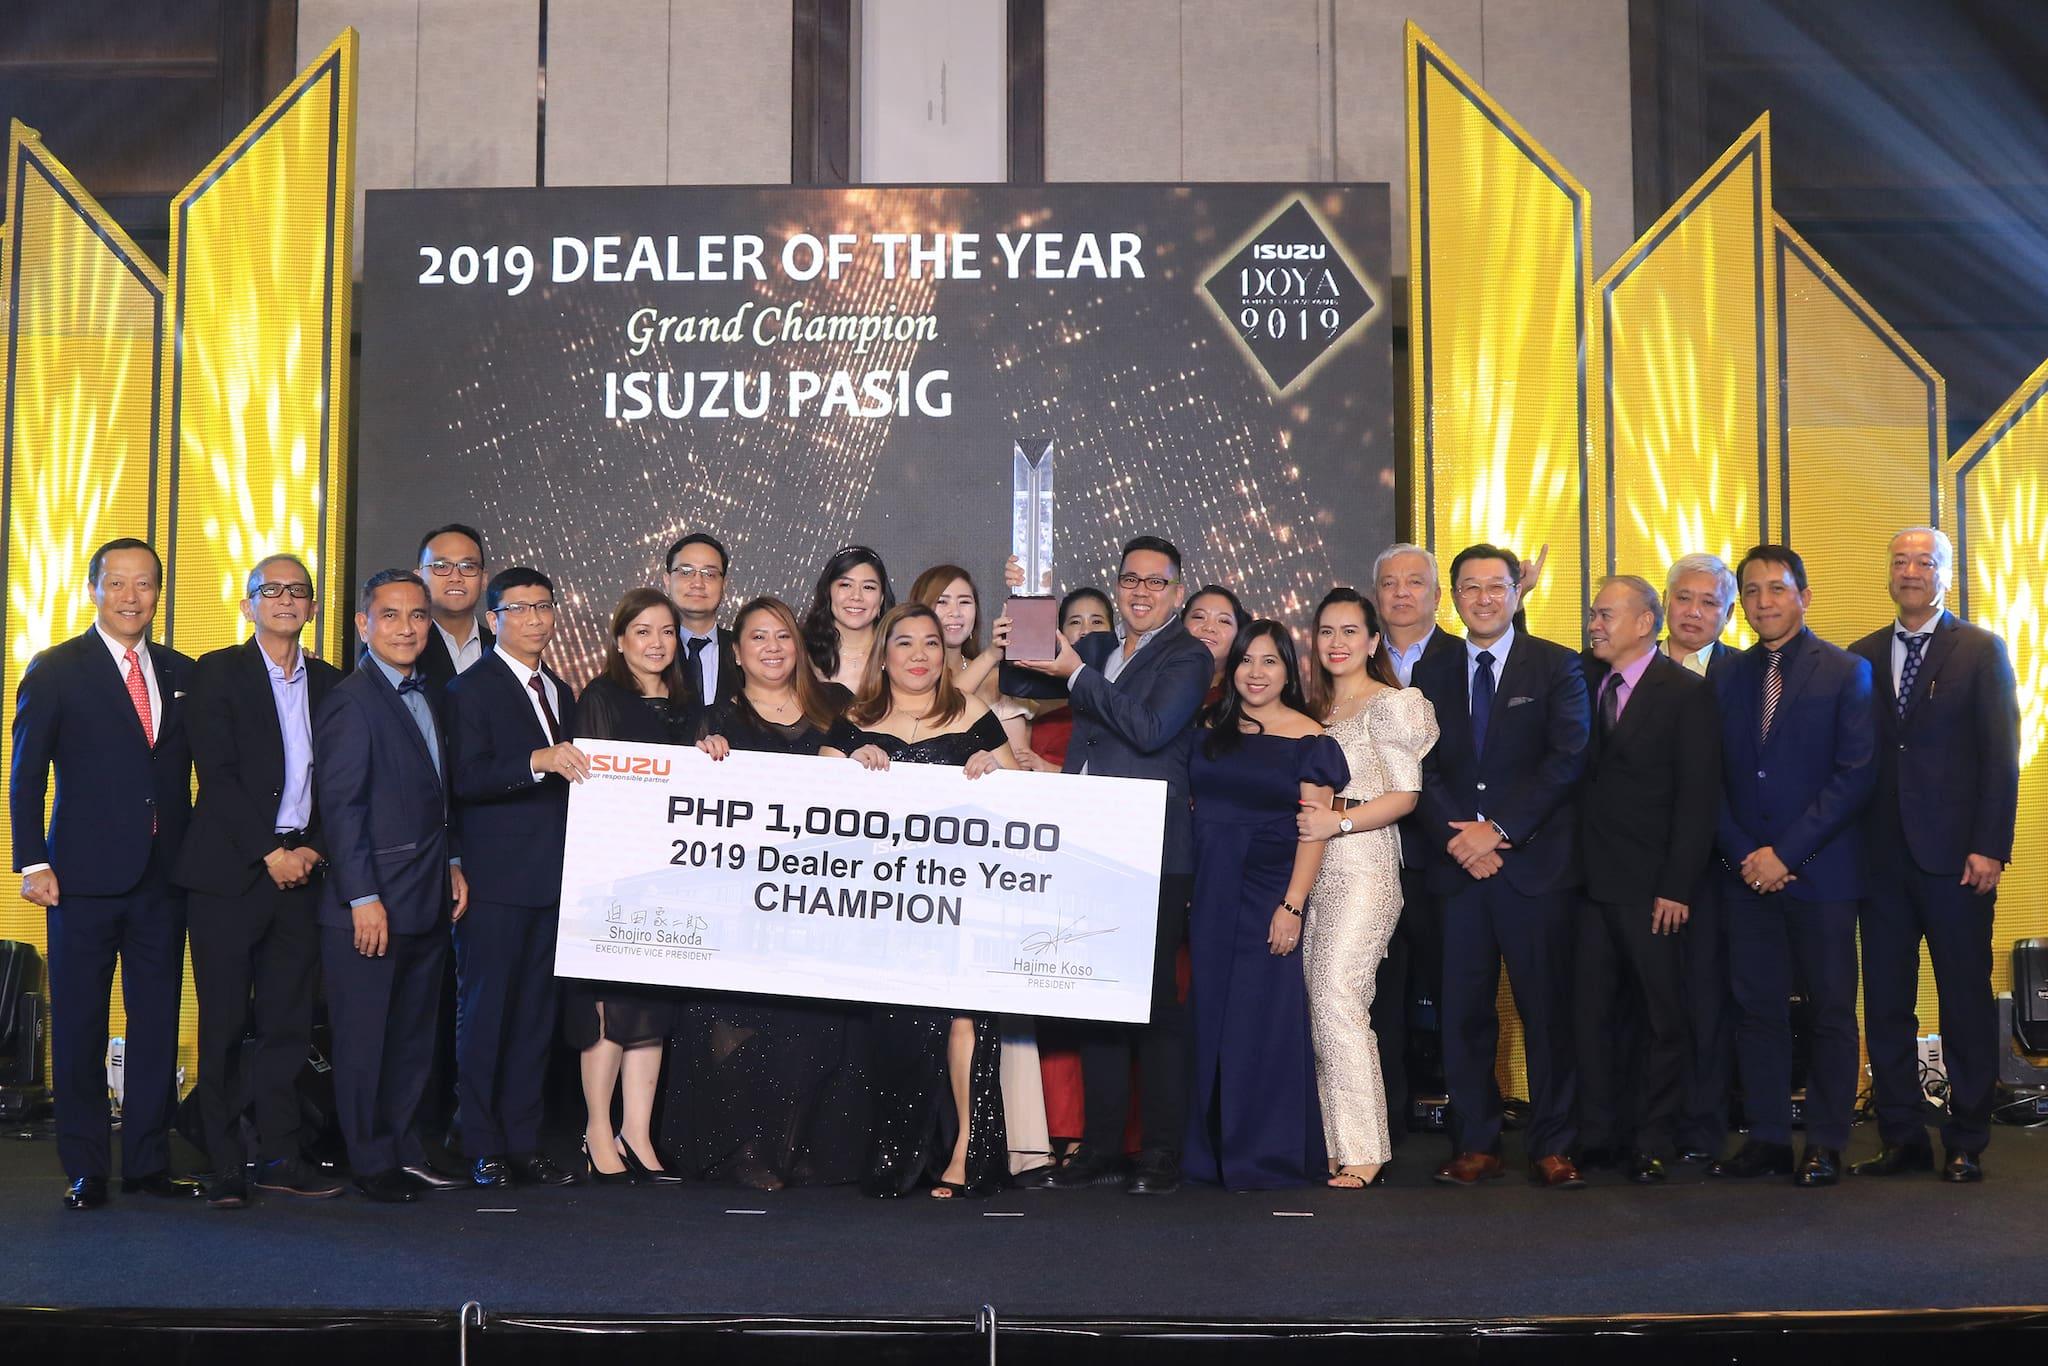 IPC Pasig wins 2019 DOYA, Bulacan, Sta. Rosa runners-up